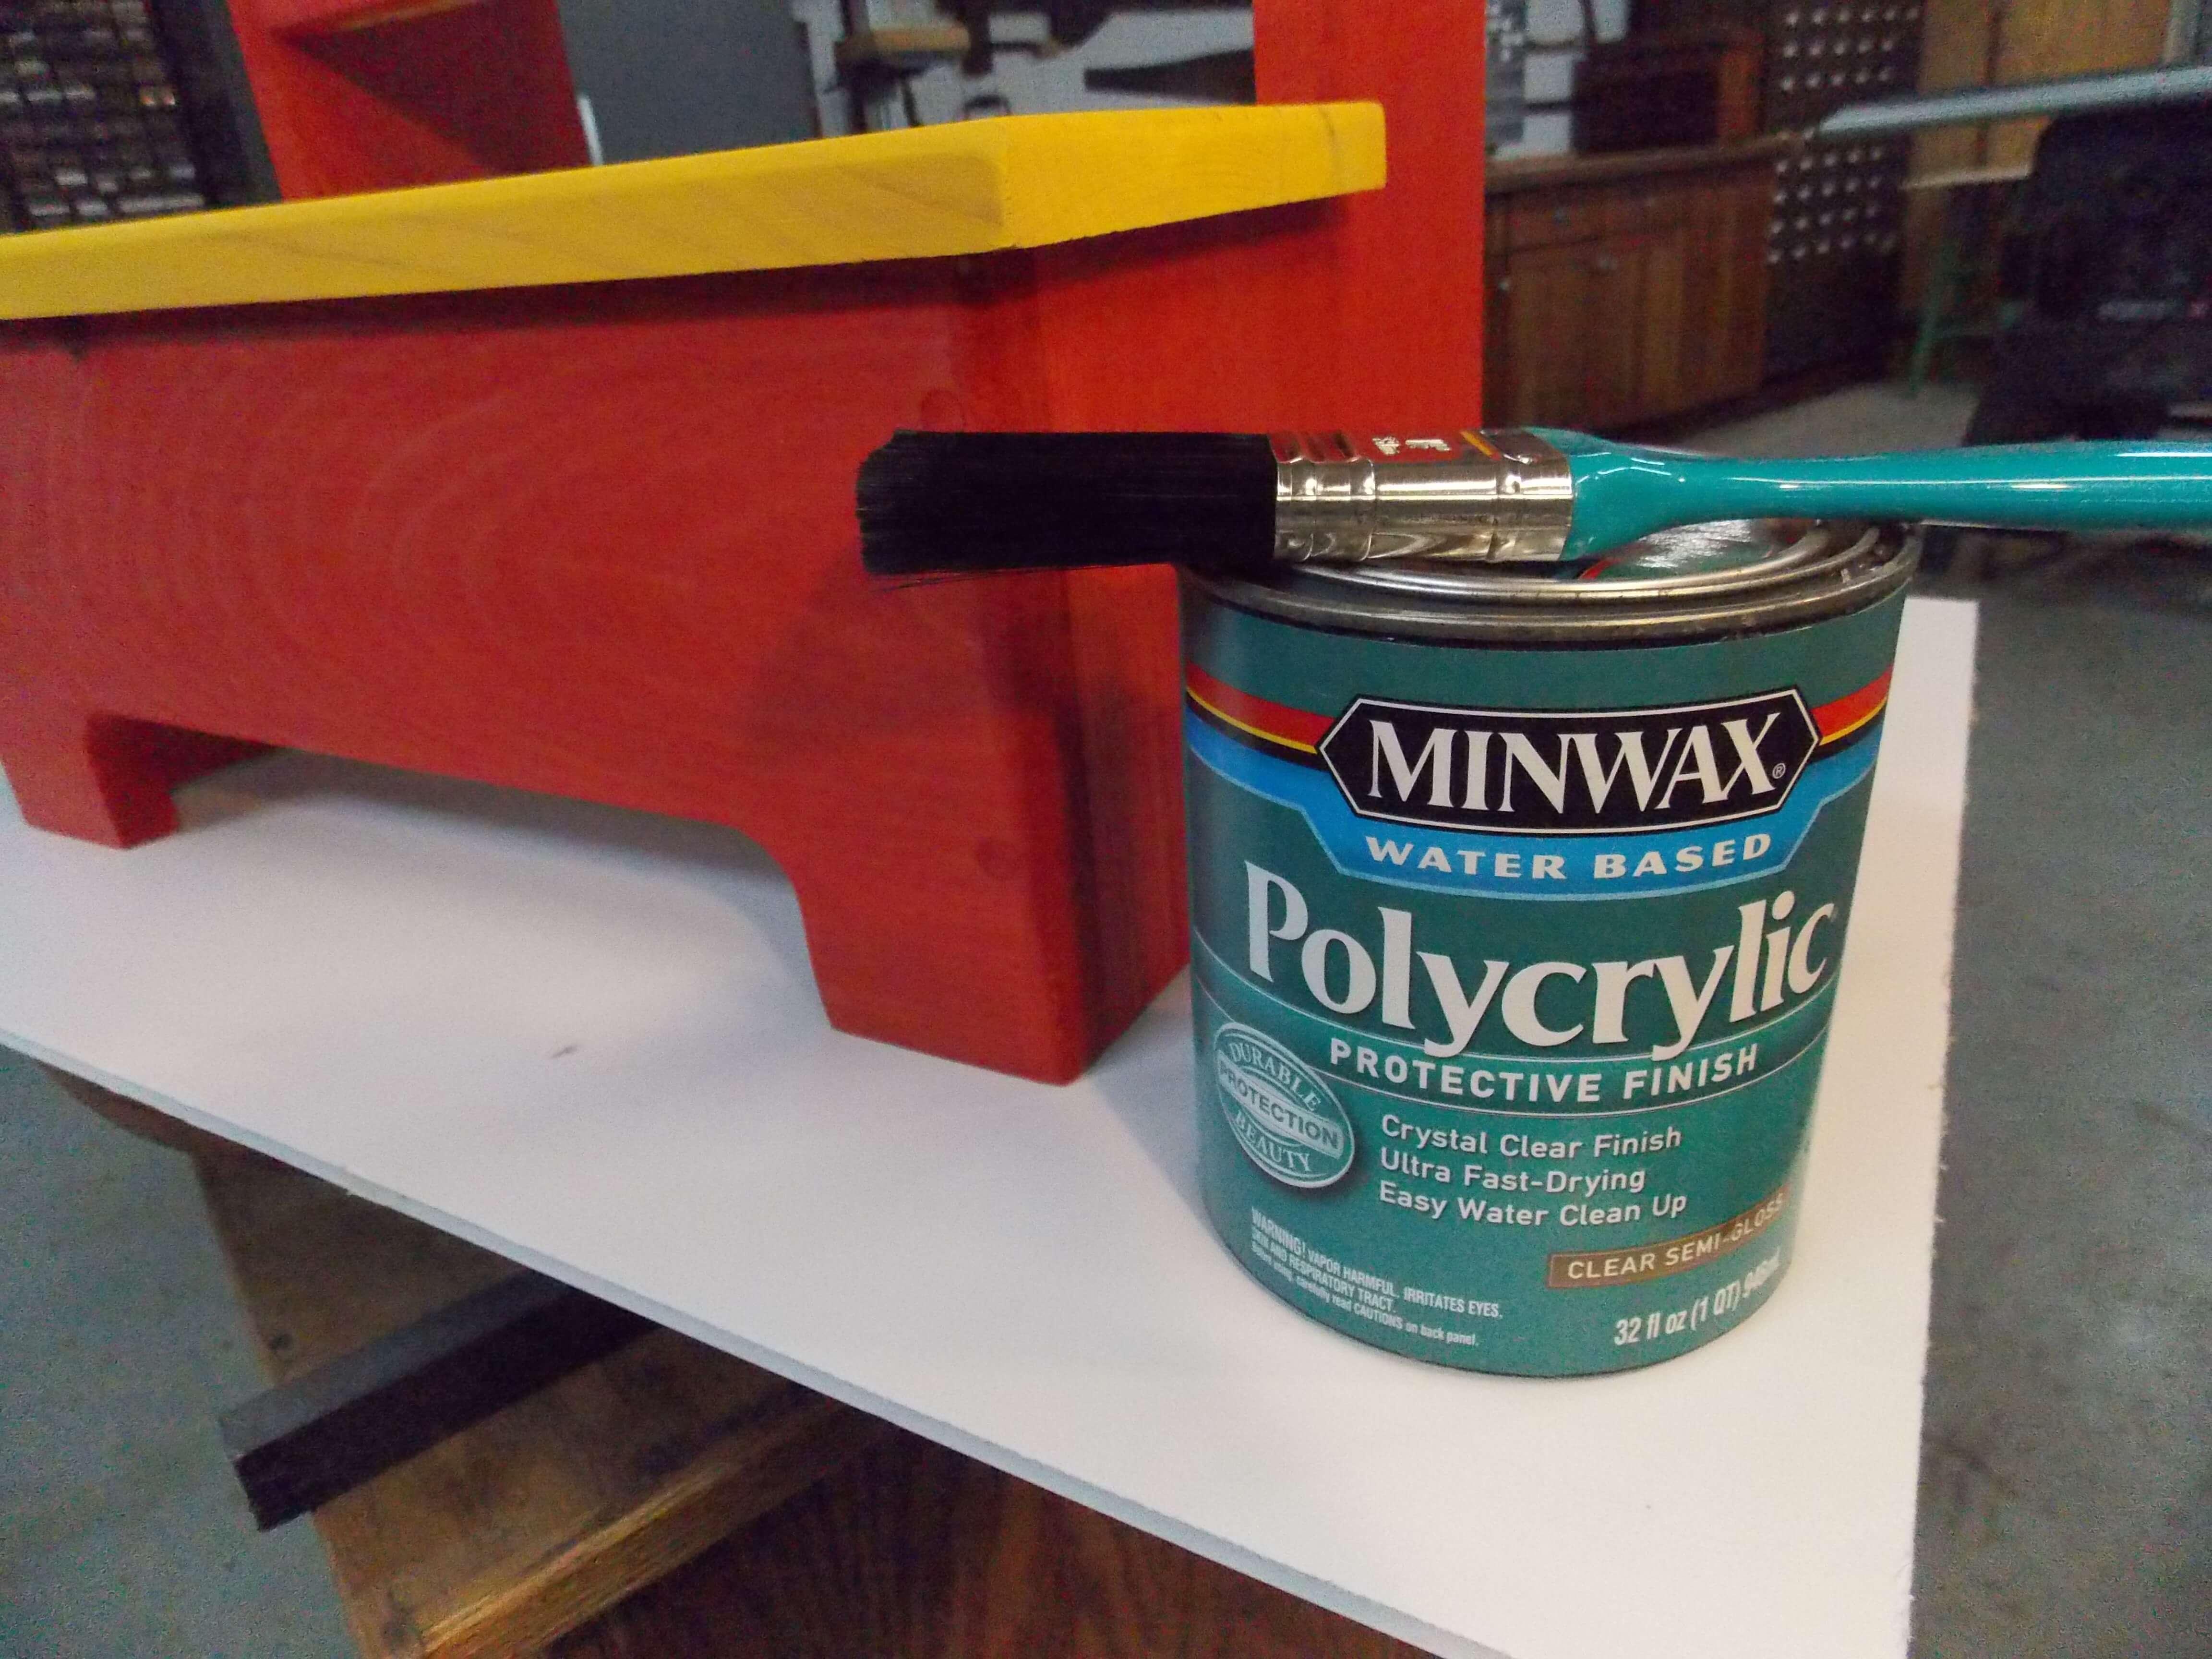 Minwax Polycrylic Protective Wood Finish Alongside Colorful Step Stool